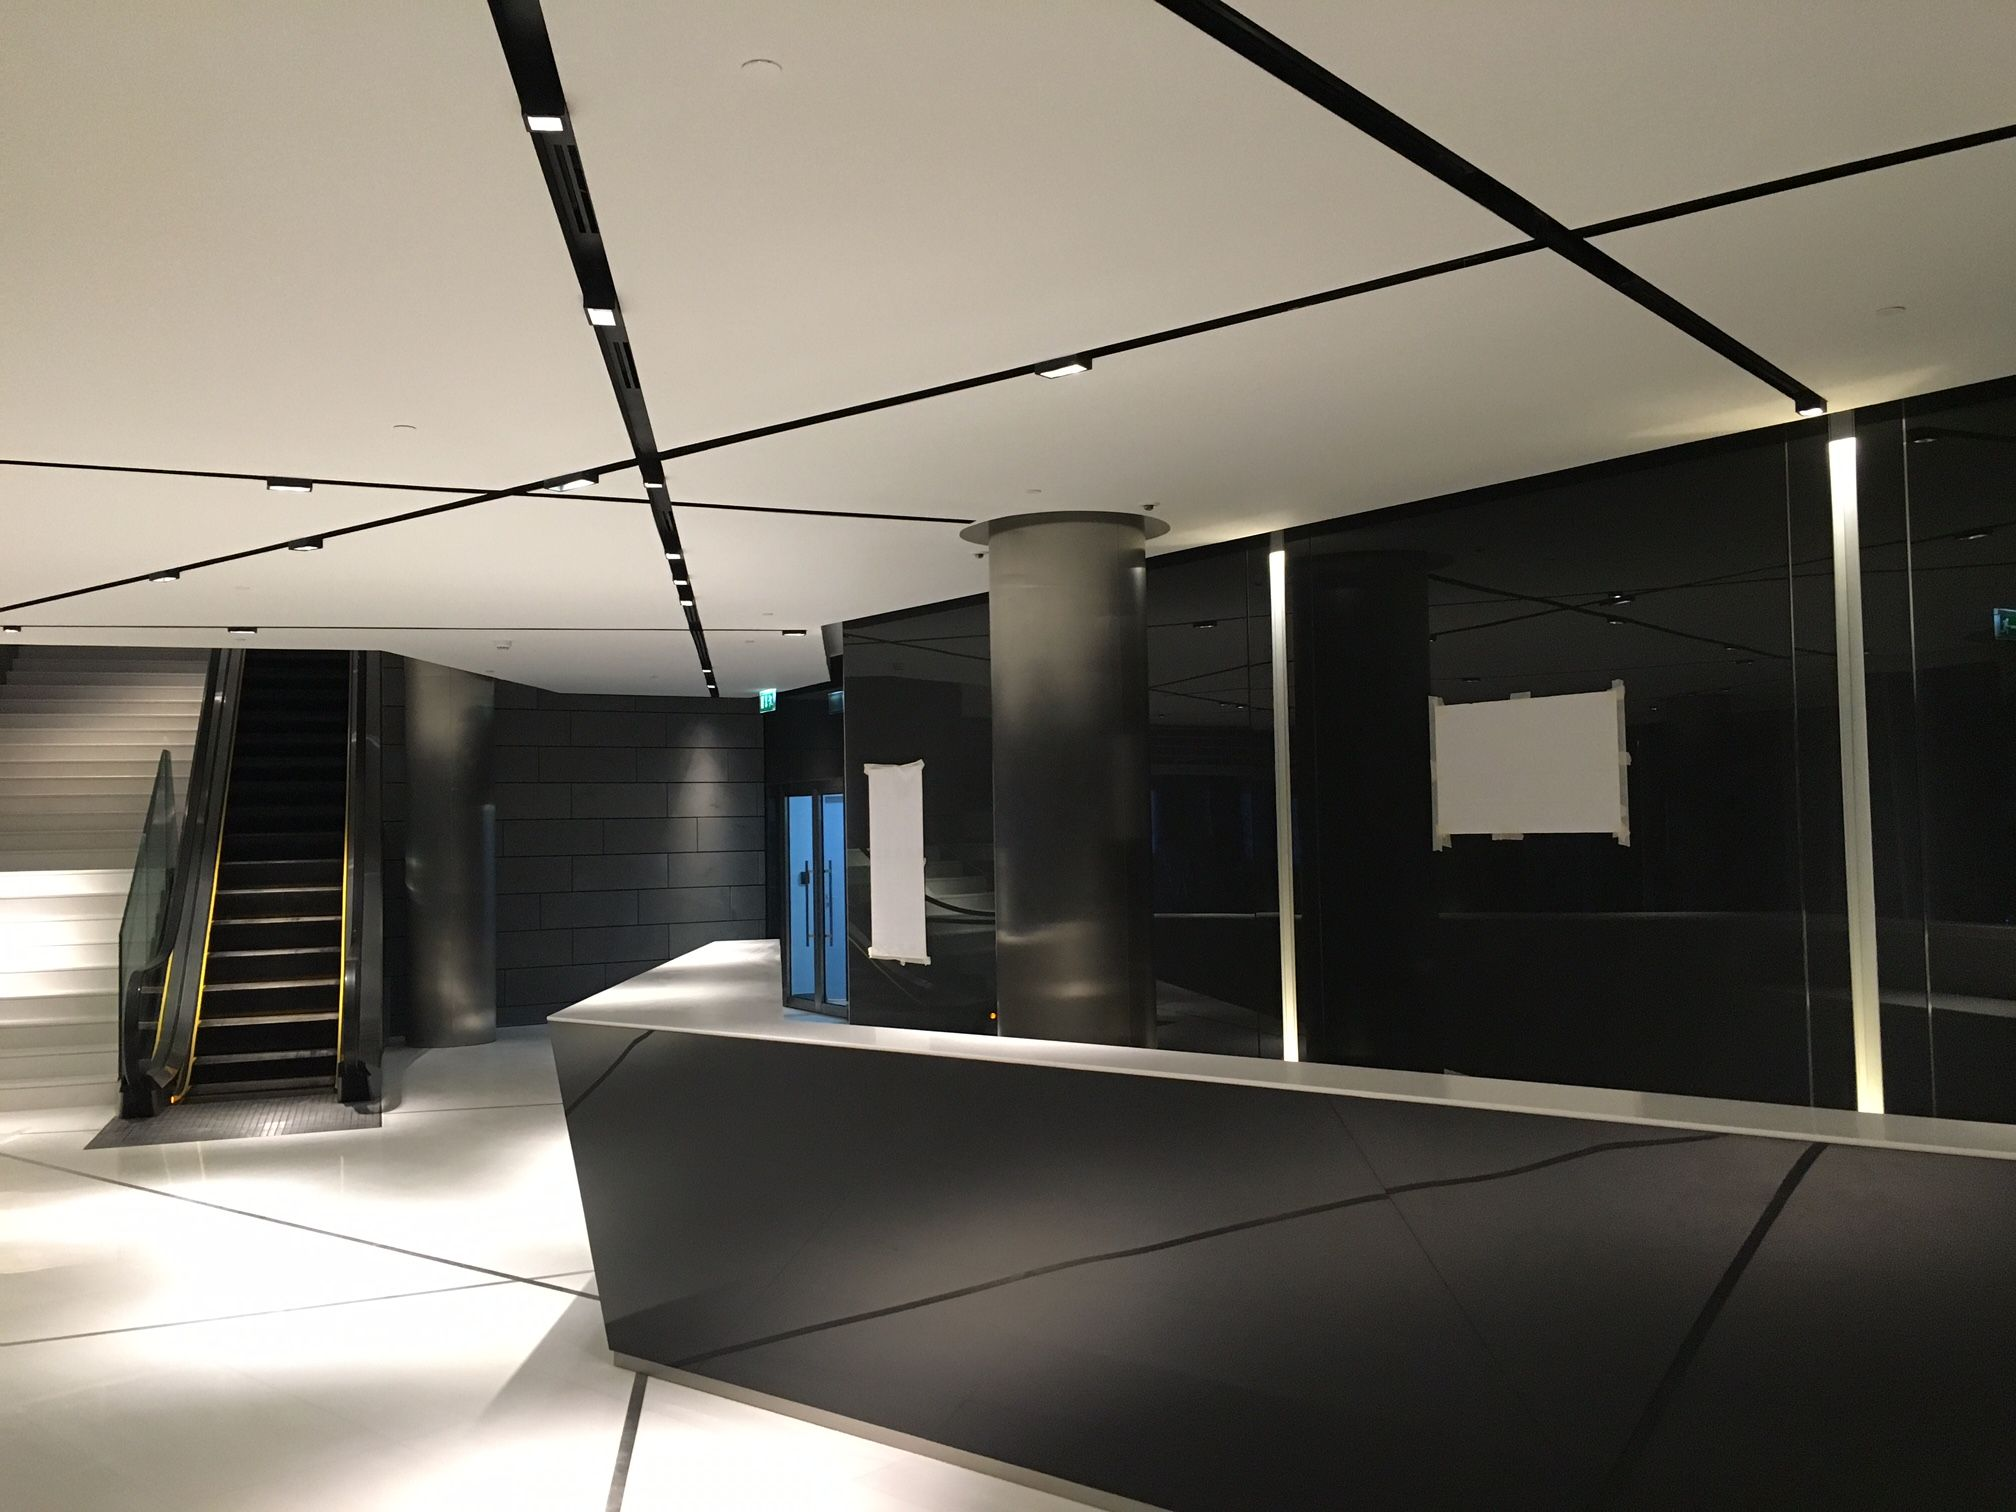 kreon lighting. Unique Kreon Crossed Kreon Prologe InDolma Lighting Profile With Integrated Ventilation  Slots With Lighting H